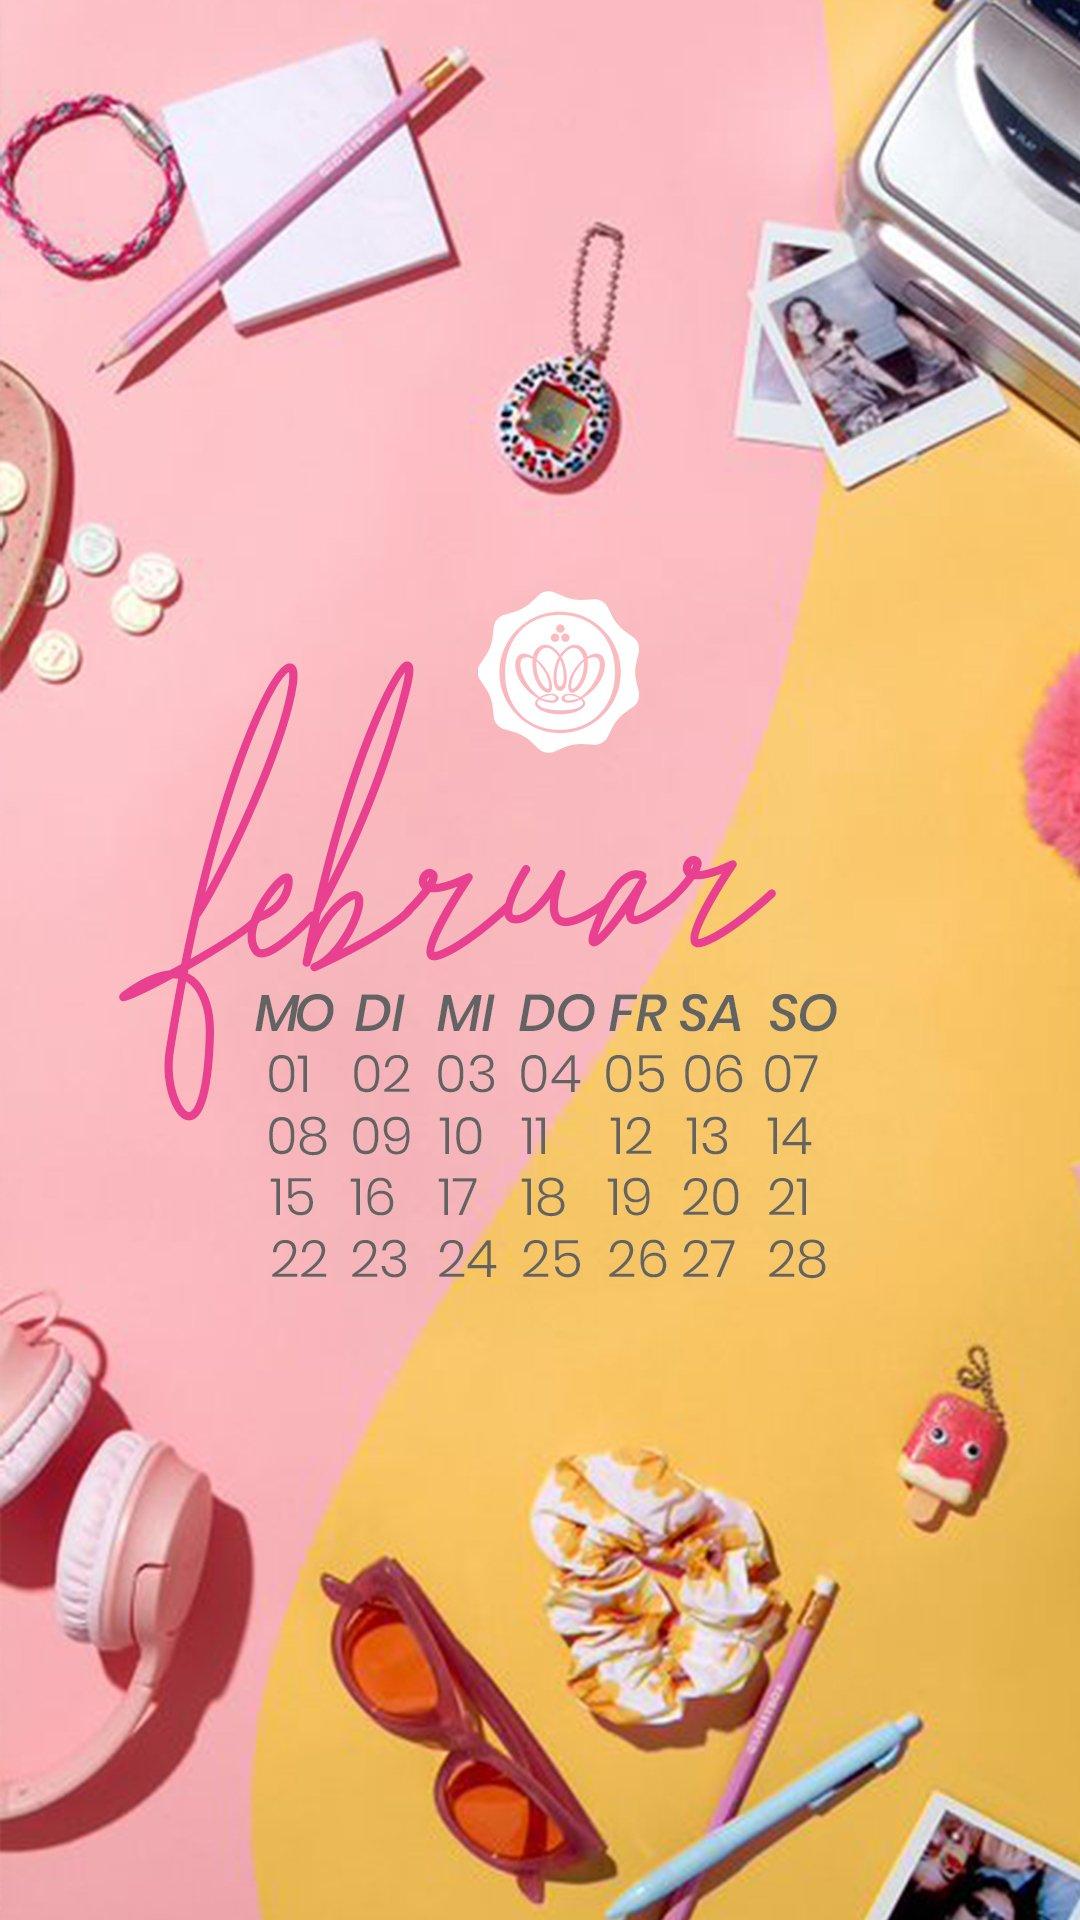 glossy-wallpaper-screensaver-glossybox-februar-2021-gratis